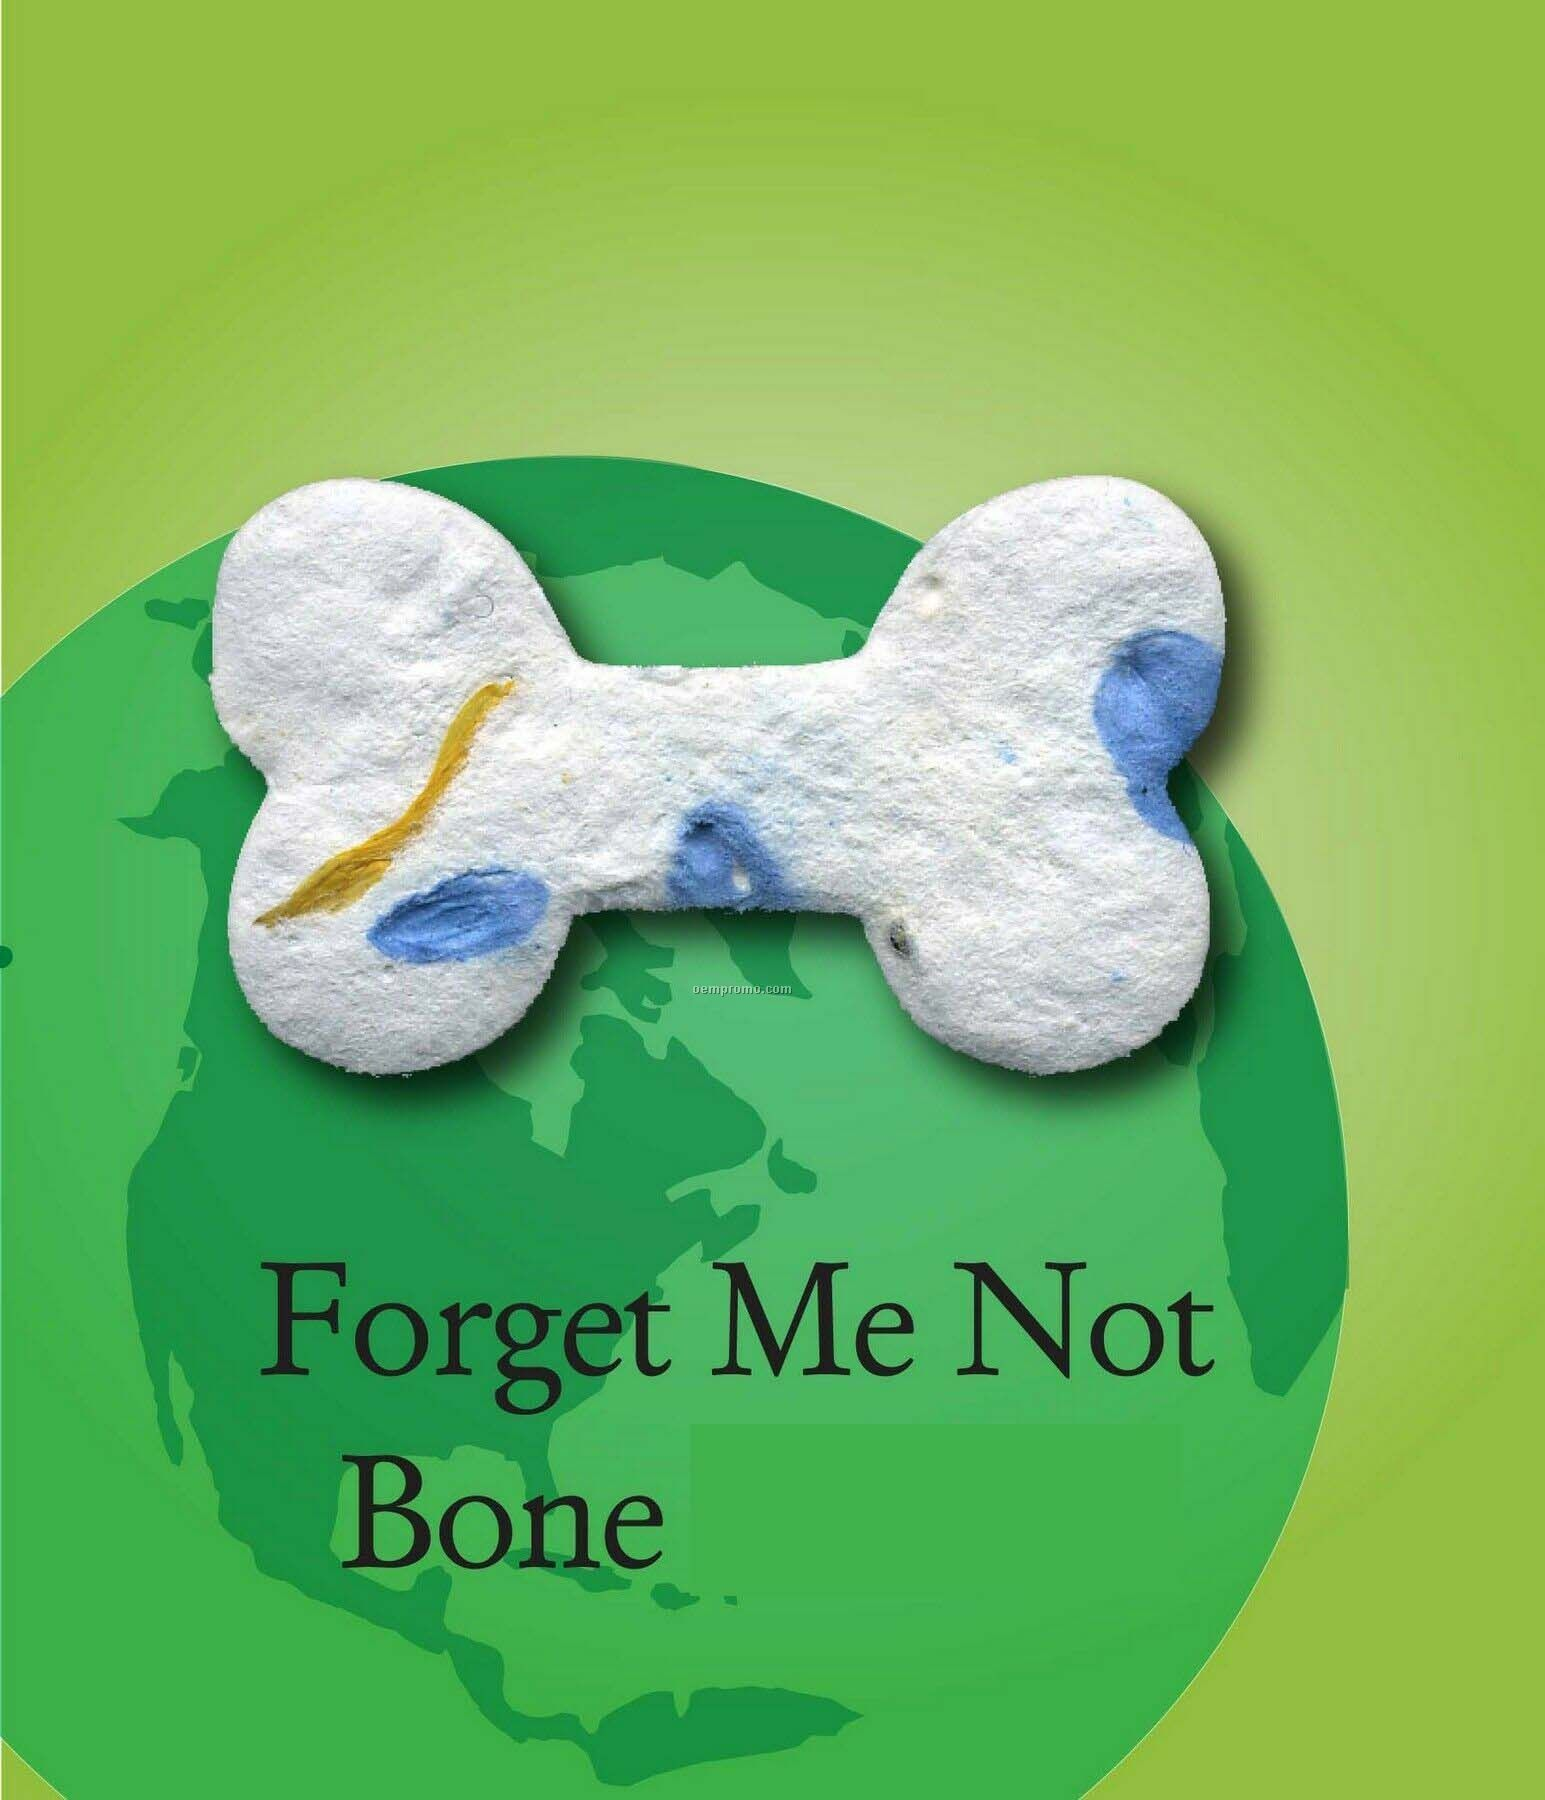 Forget Me Not Dog Bone Handmade Seed Plantable Mini